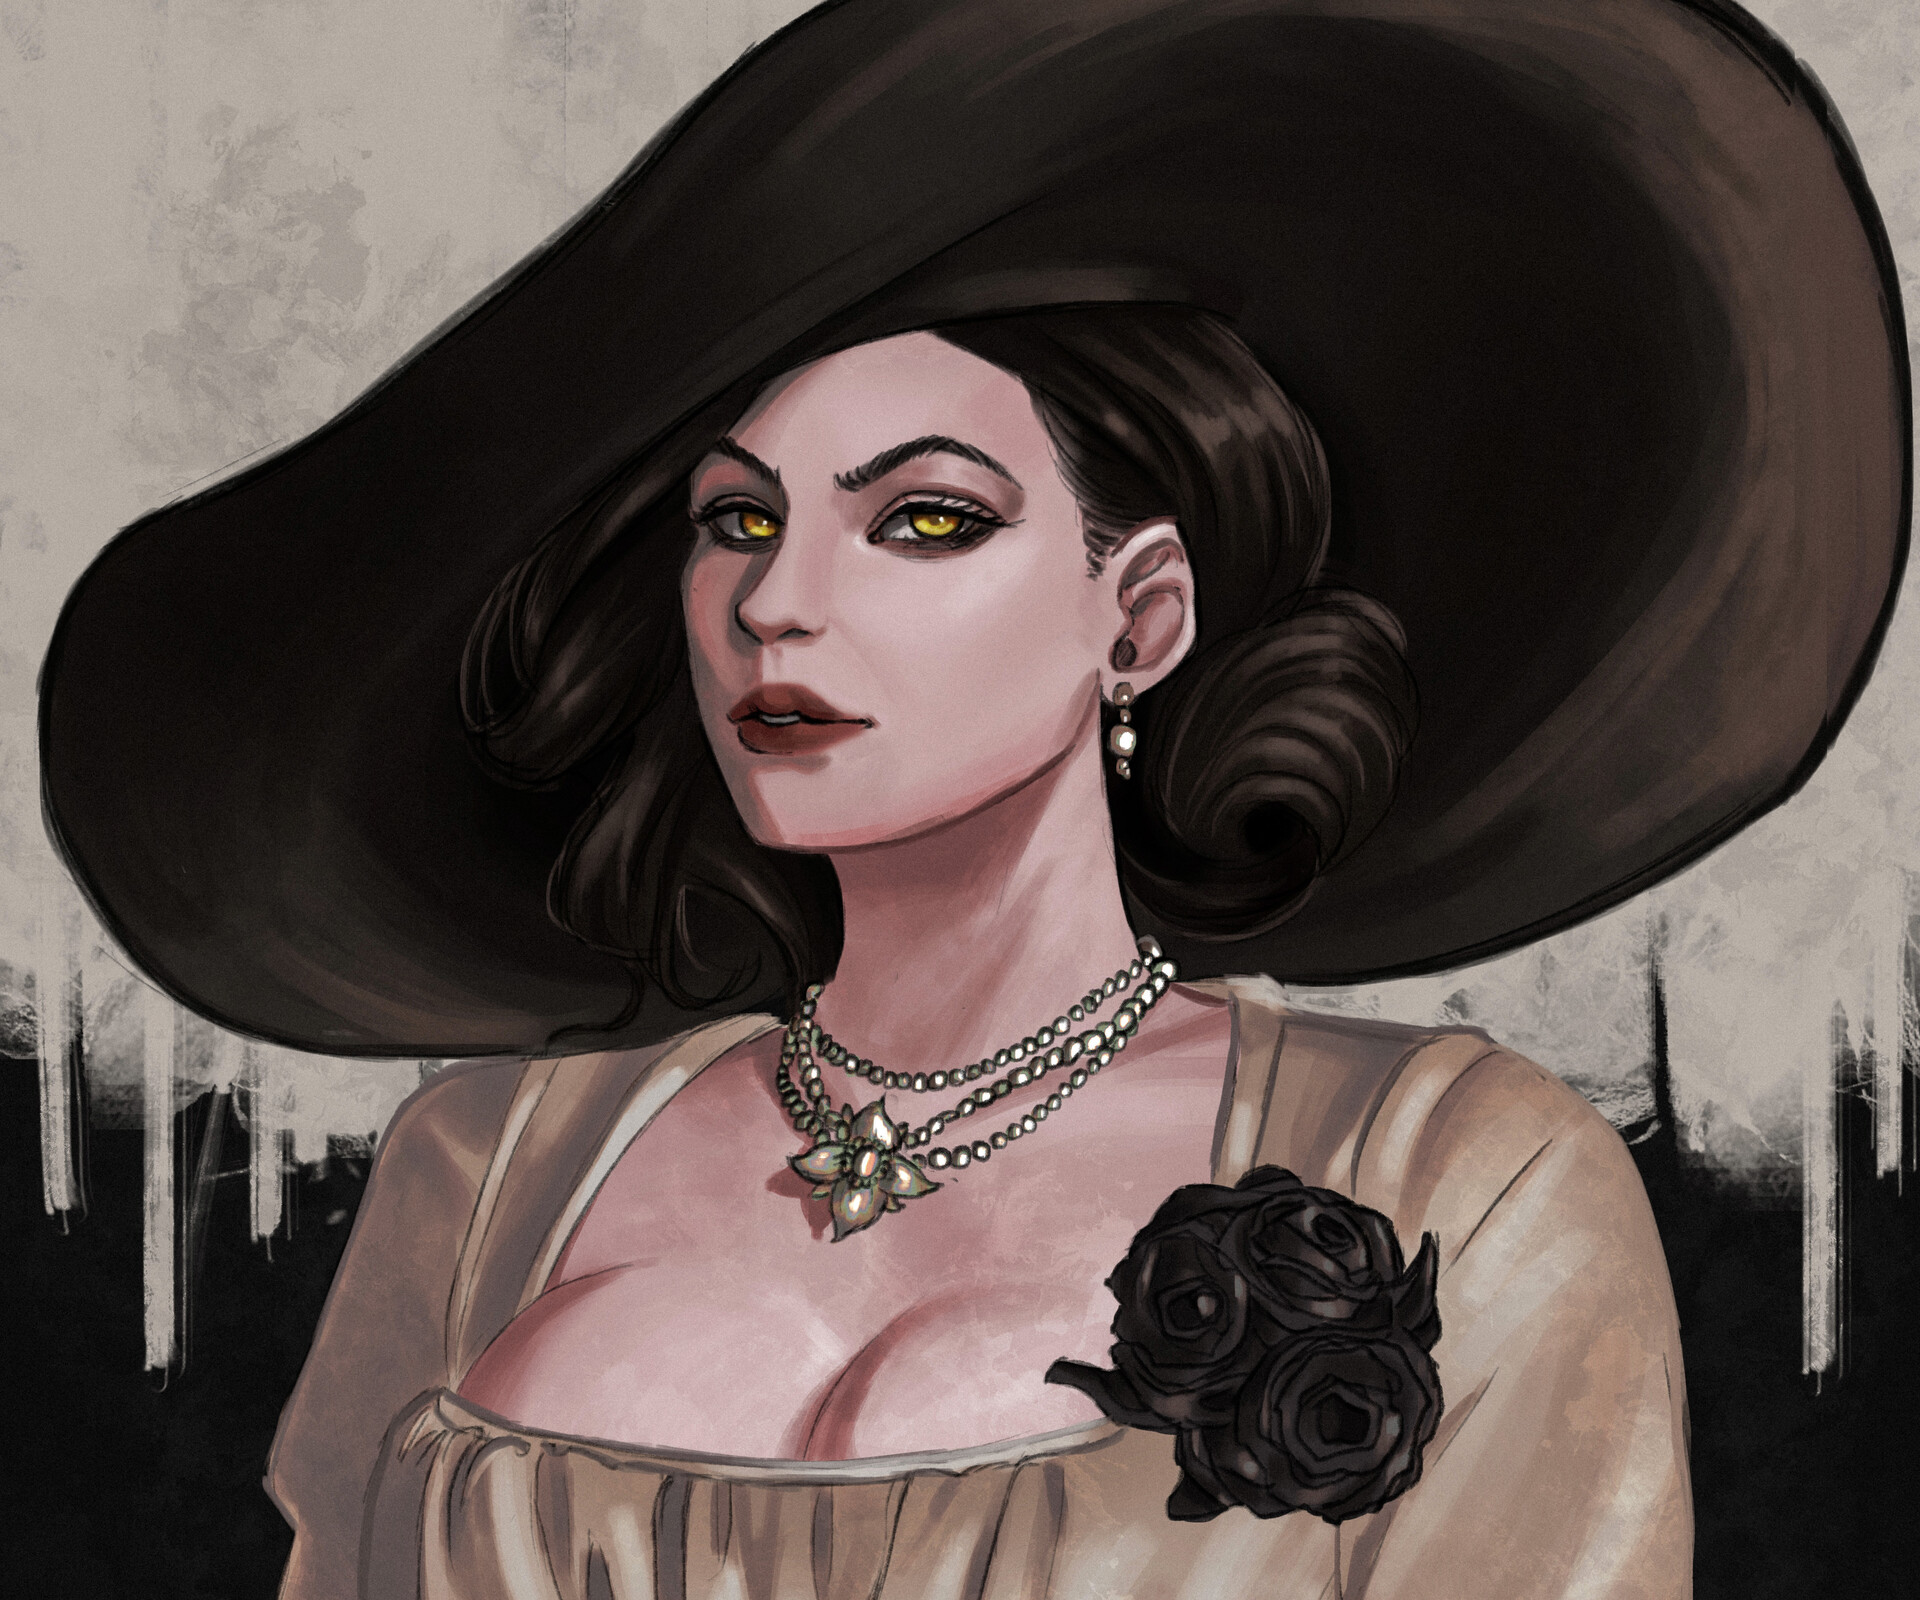 Resident Evil Alcina Dimitrescu 1920x1600